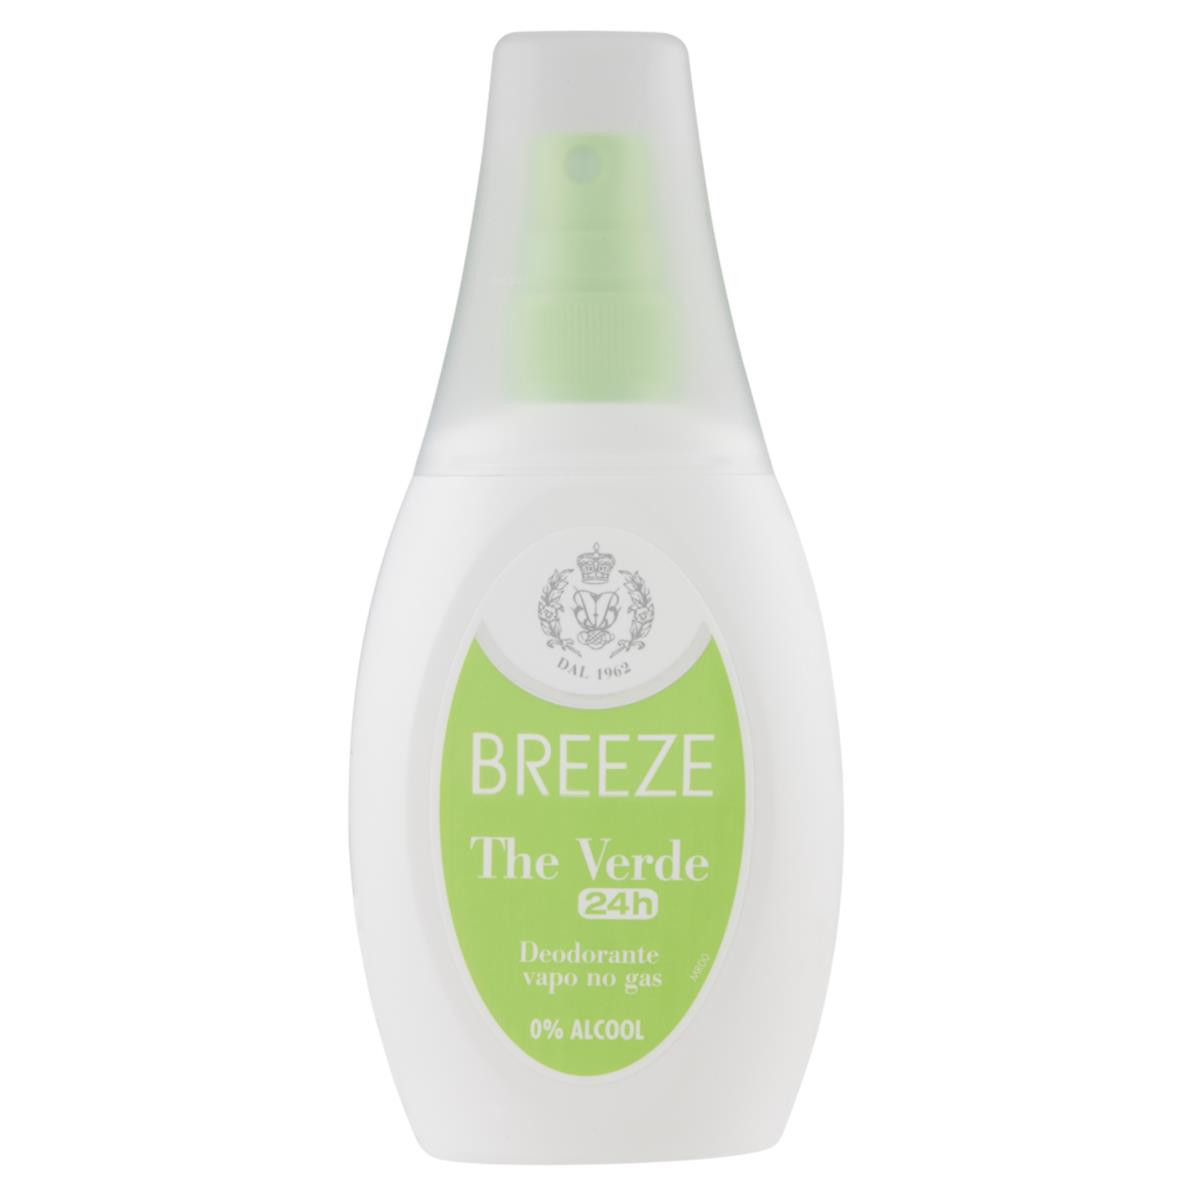 Deodorante No gas Unisex Breeze